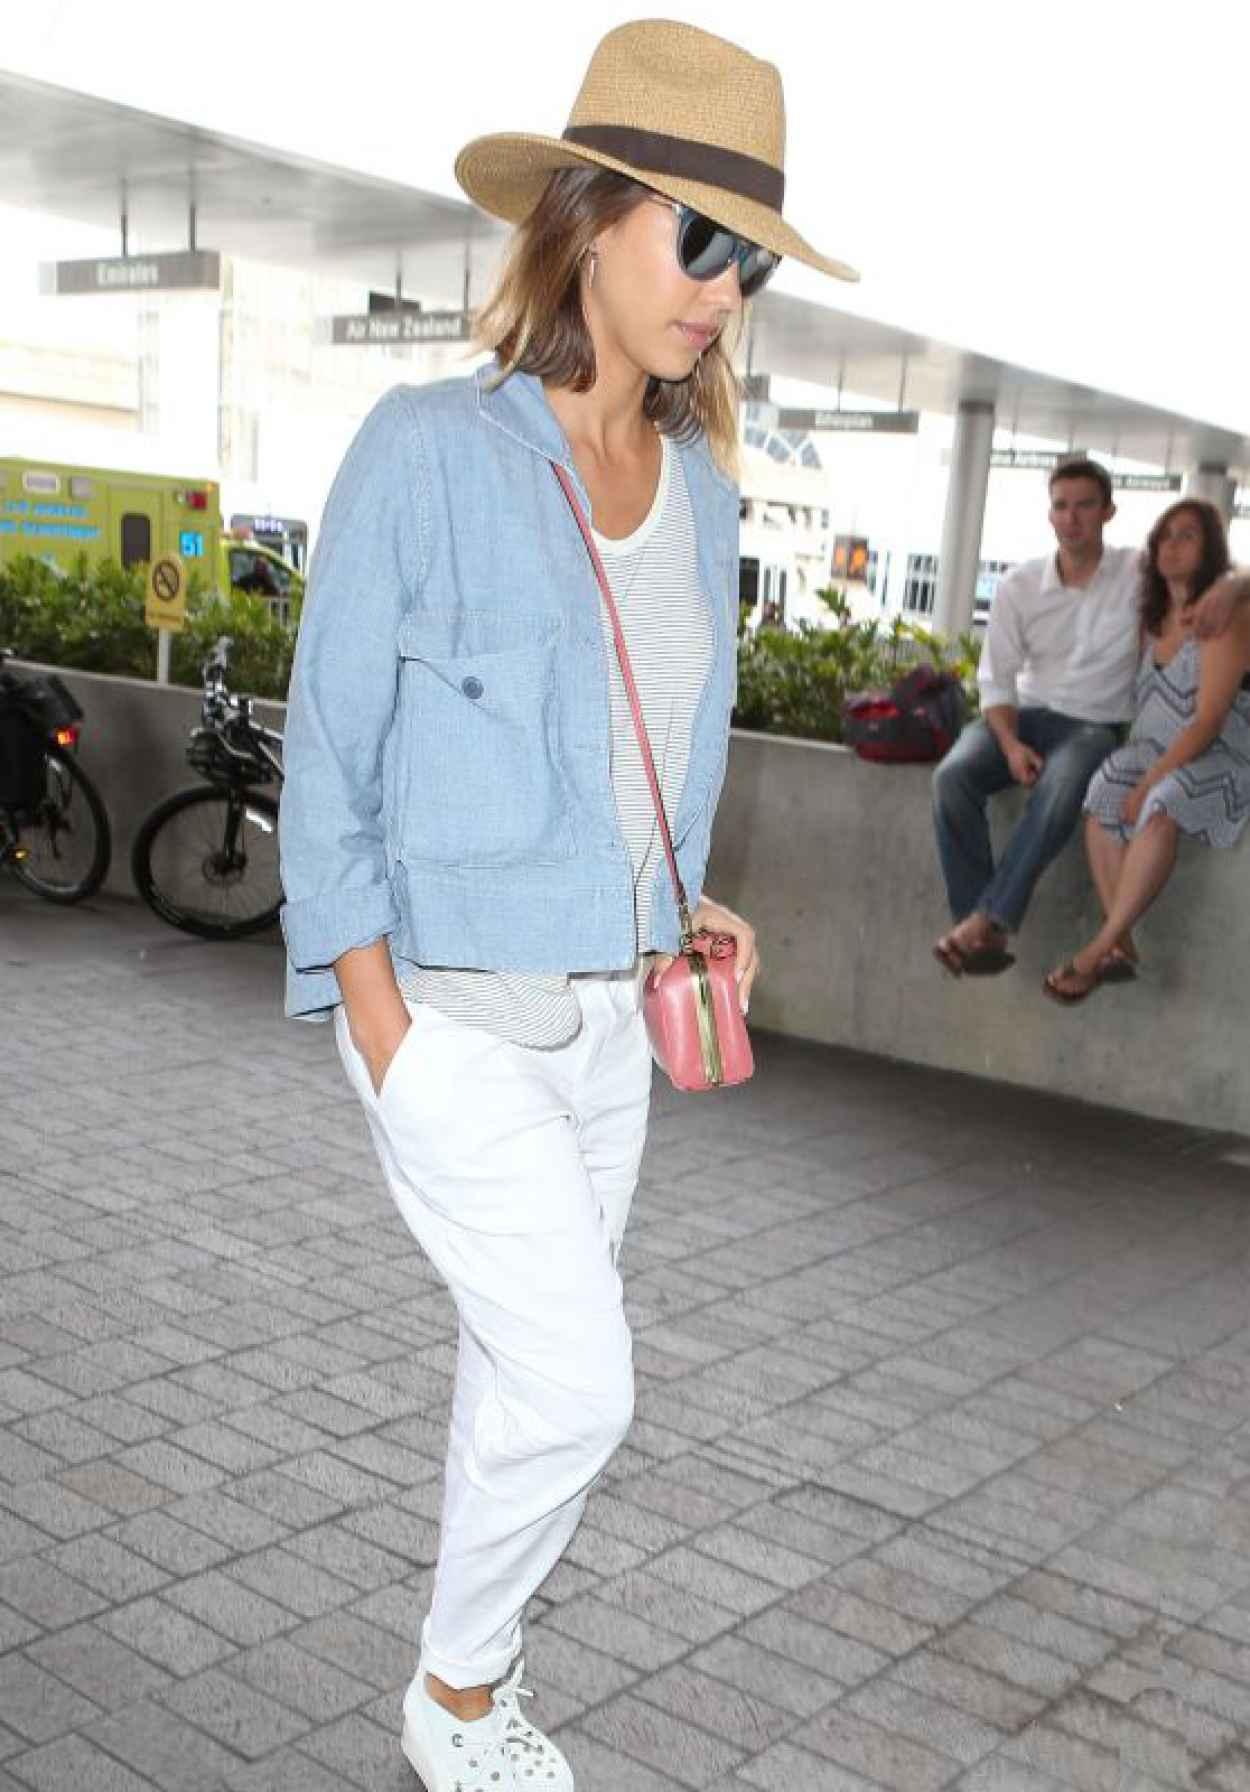 Jessica Alba Airport Fashion - at LAX, July 2015-1